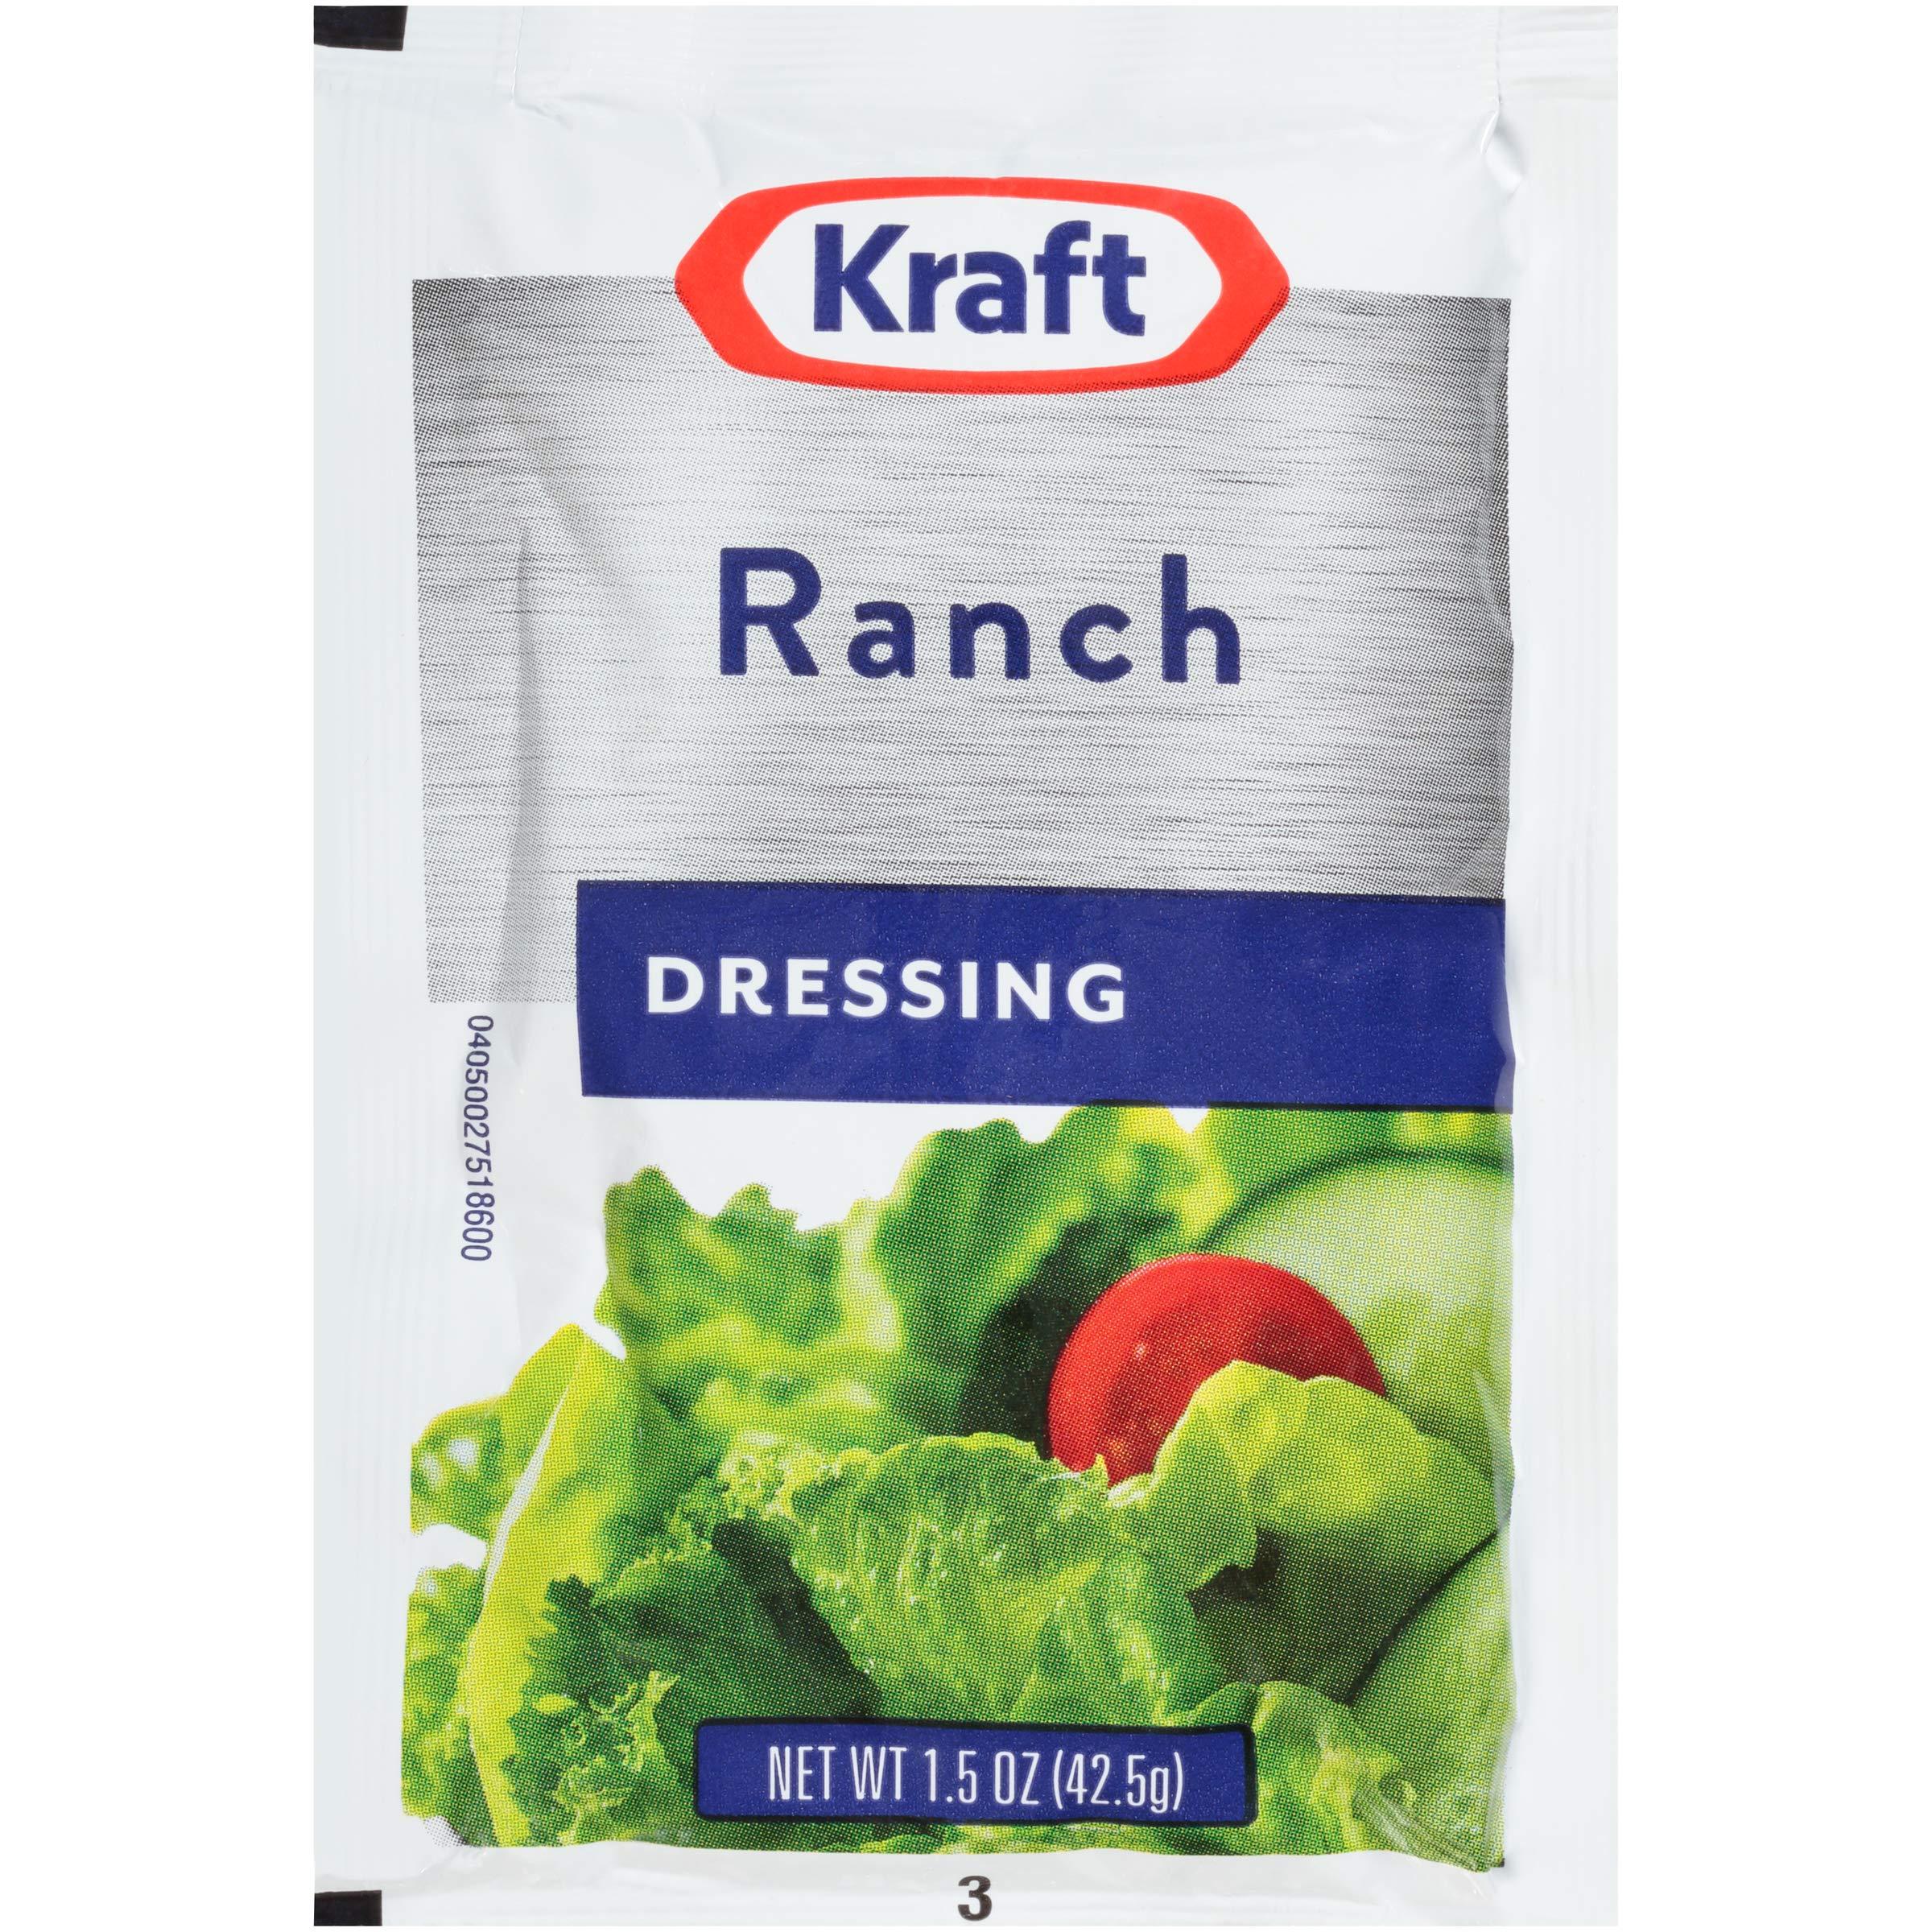 HEINZ Single Serve Italian Salad Dressing 1 oz. Packets (Pack of 100)